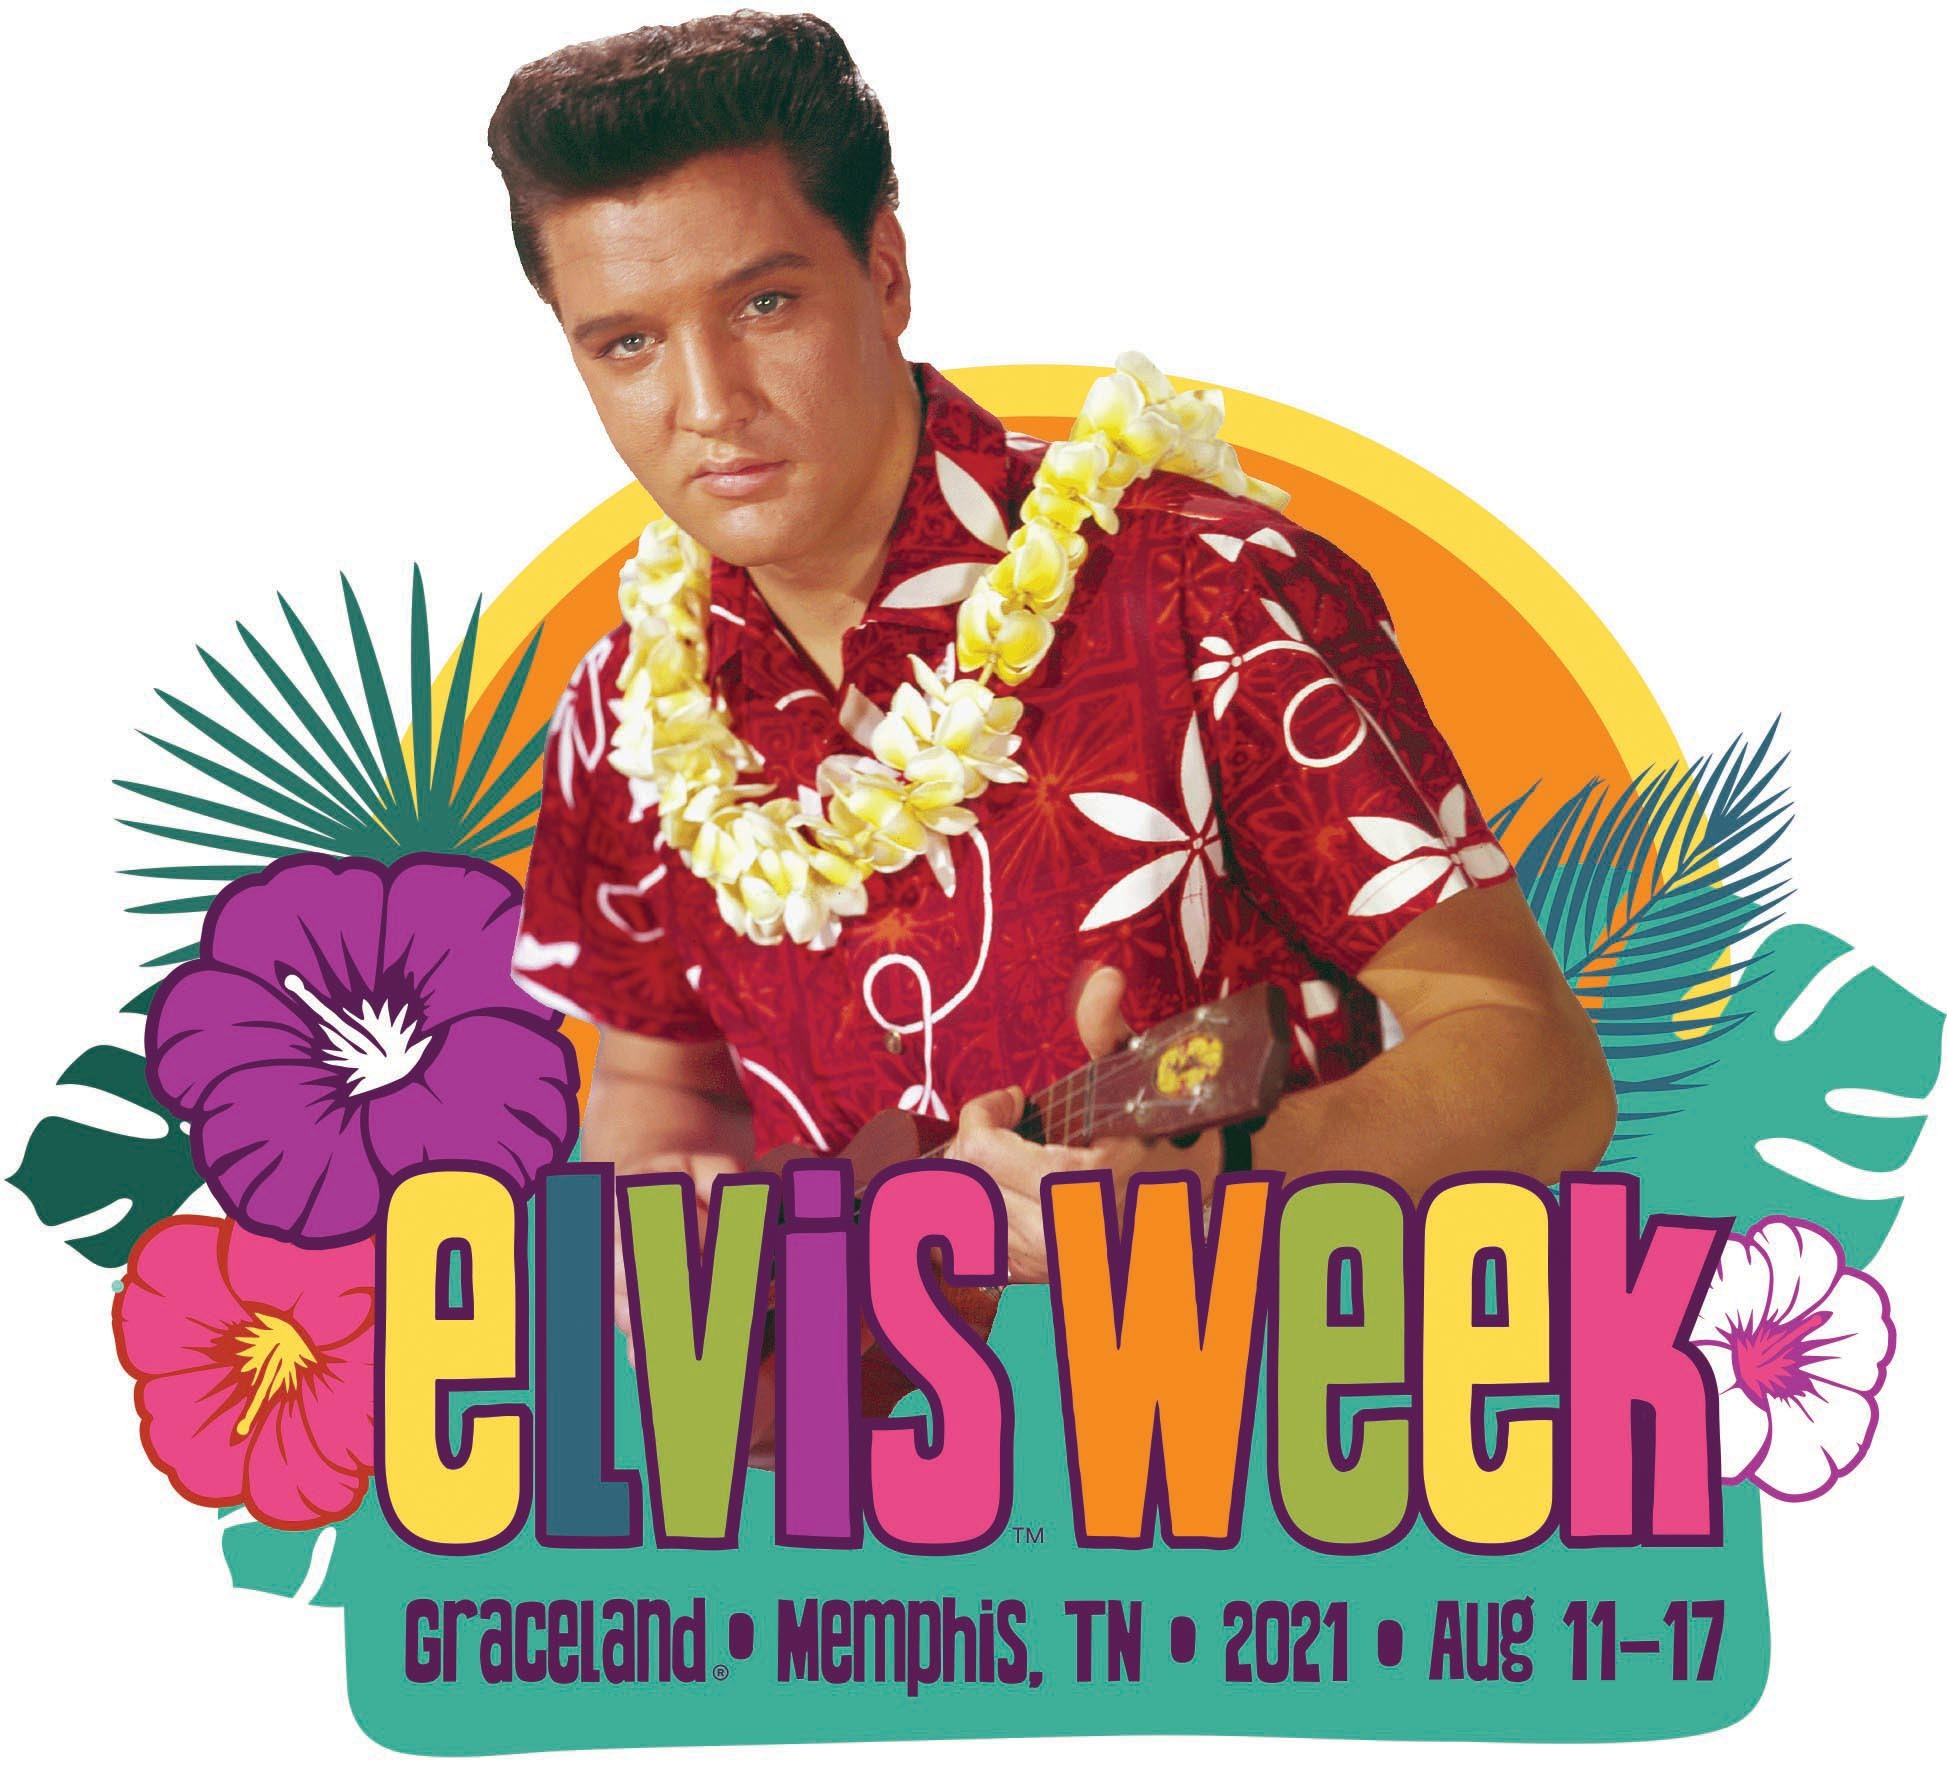 Elvis Presley's Graceland Announces Plans for Elvis Week 2021 in Memphis    Business Wire